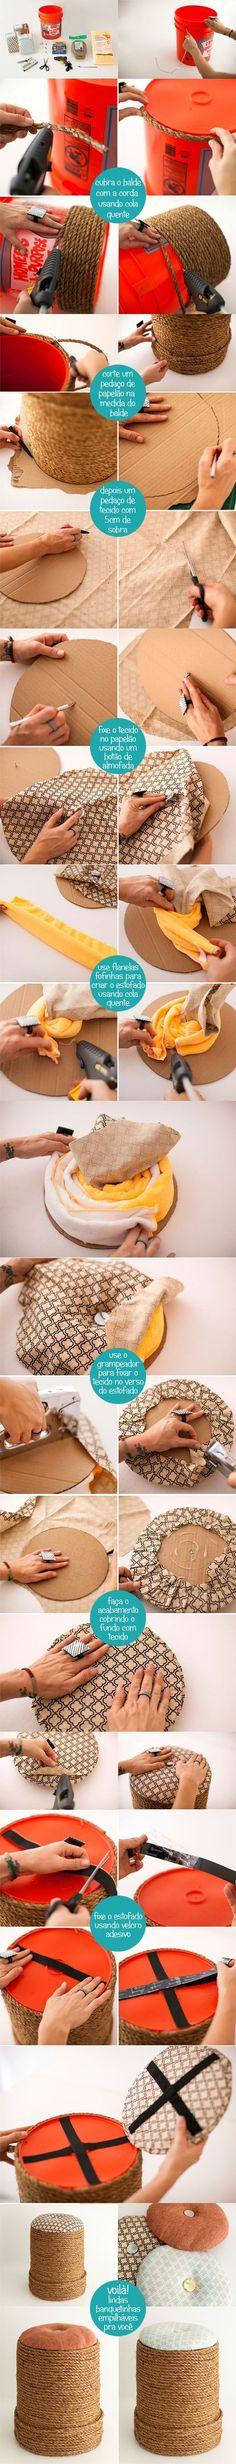 DIY – Passo a Passo: Baldes de plástico viram banquetas: